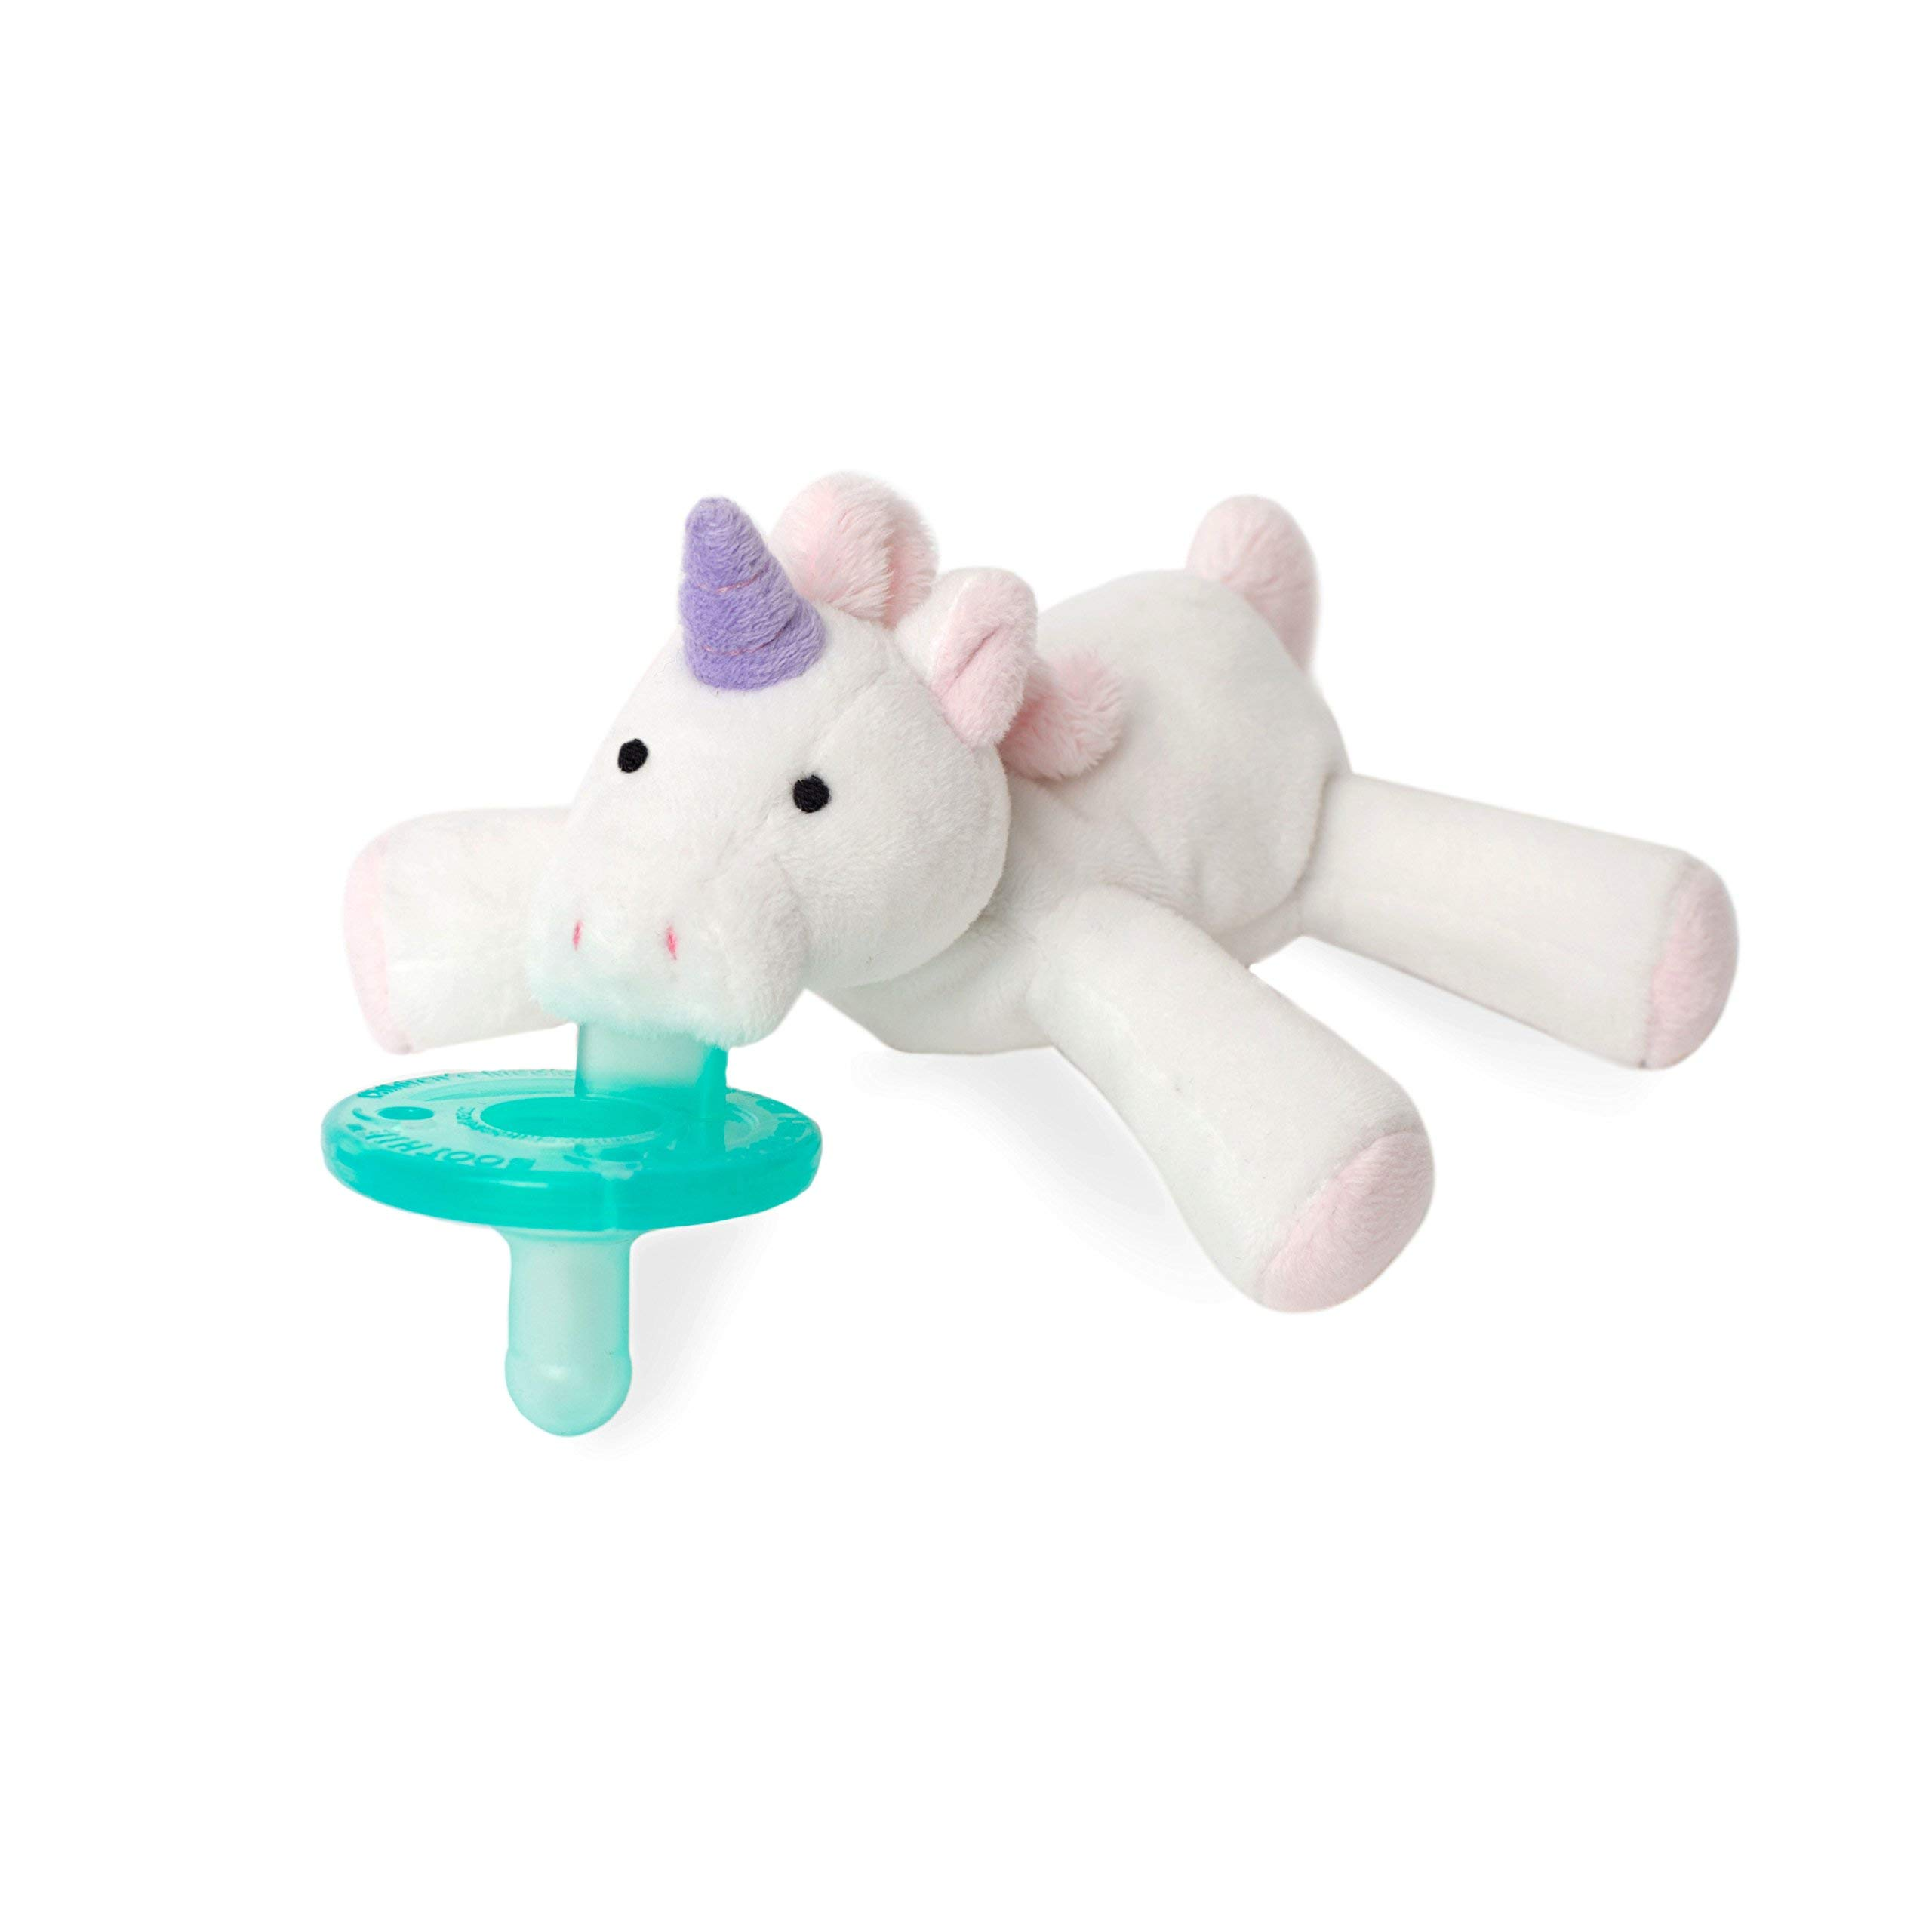 WubbaNub Infant Pacifier - Baby Unicorn by WubbaNub (Image #1)